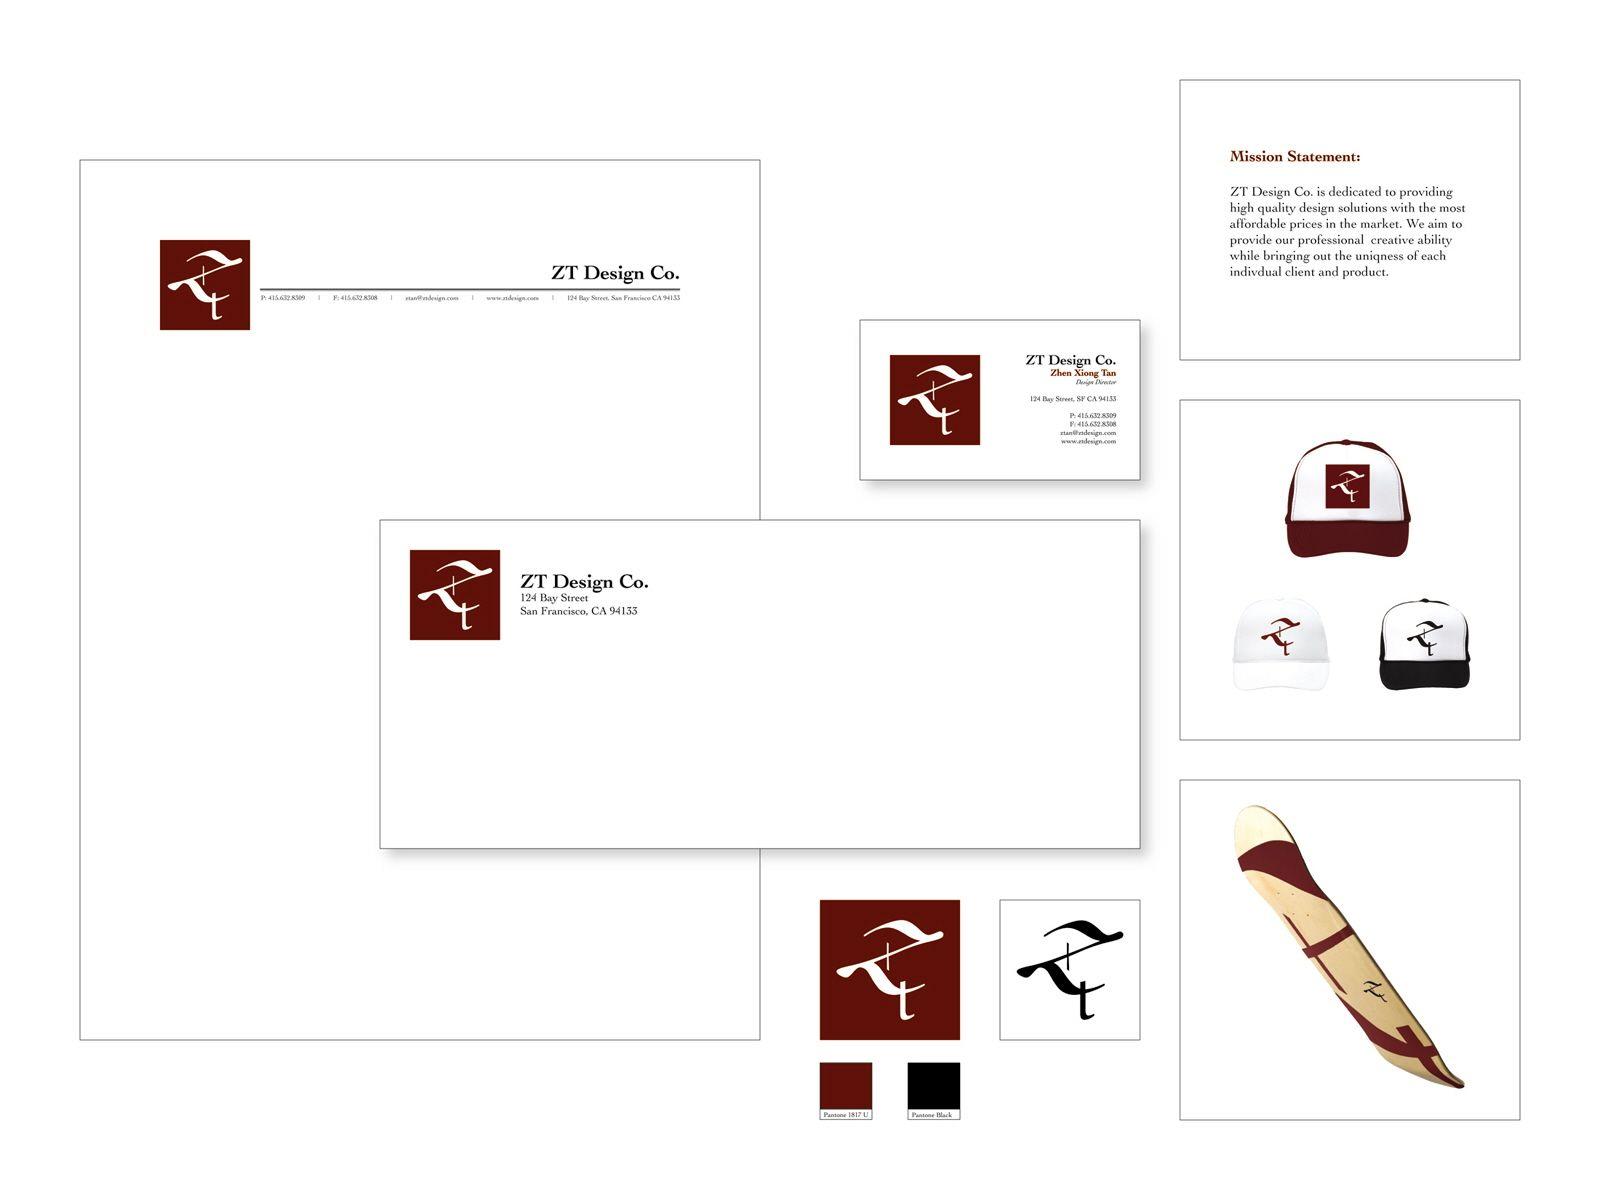 Letterhead system by Zhen Xiong Tan | letterhead, business card ...